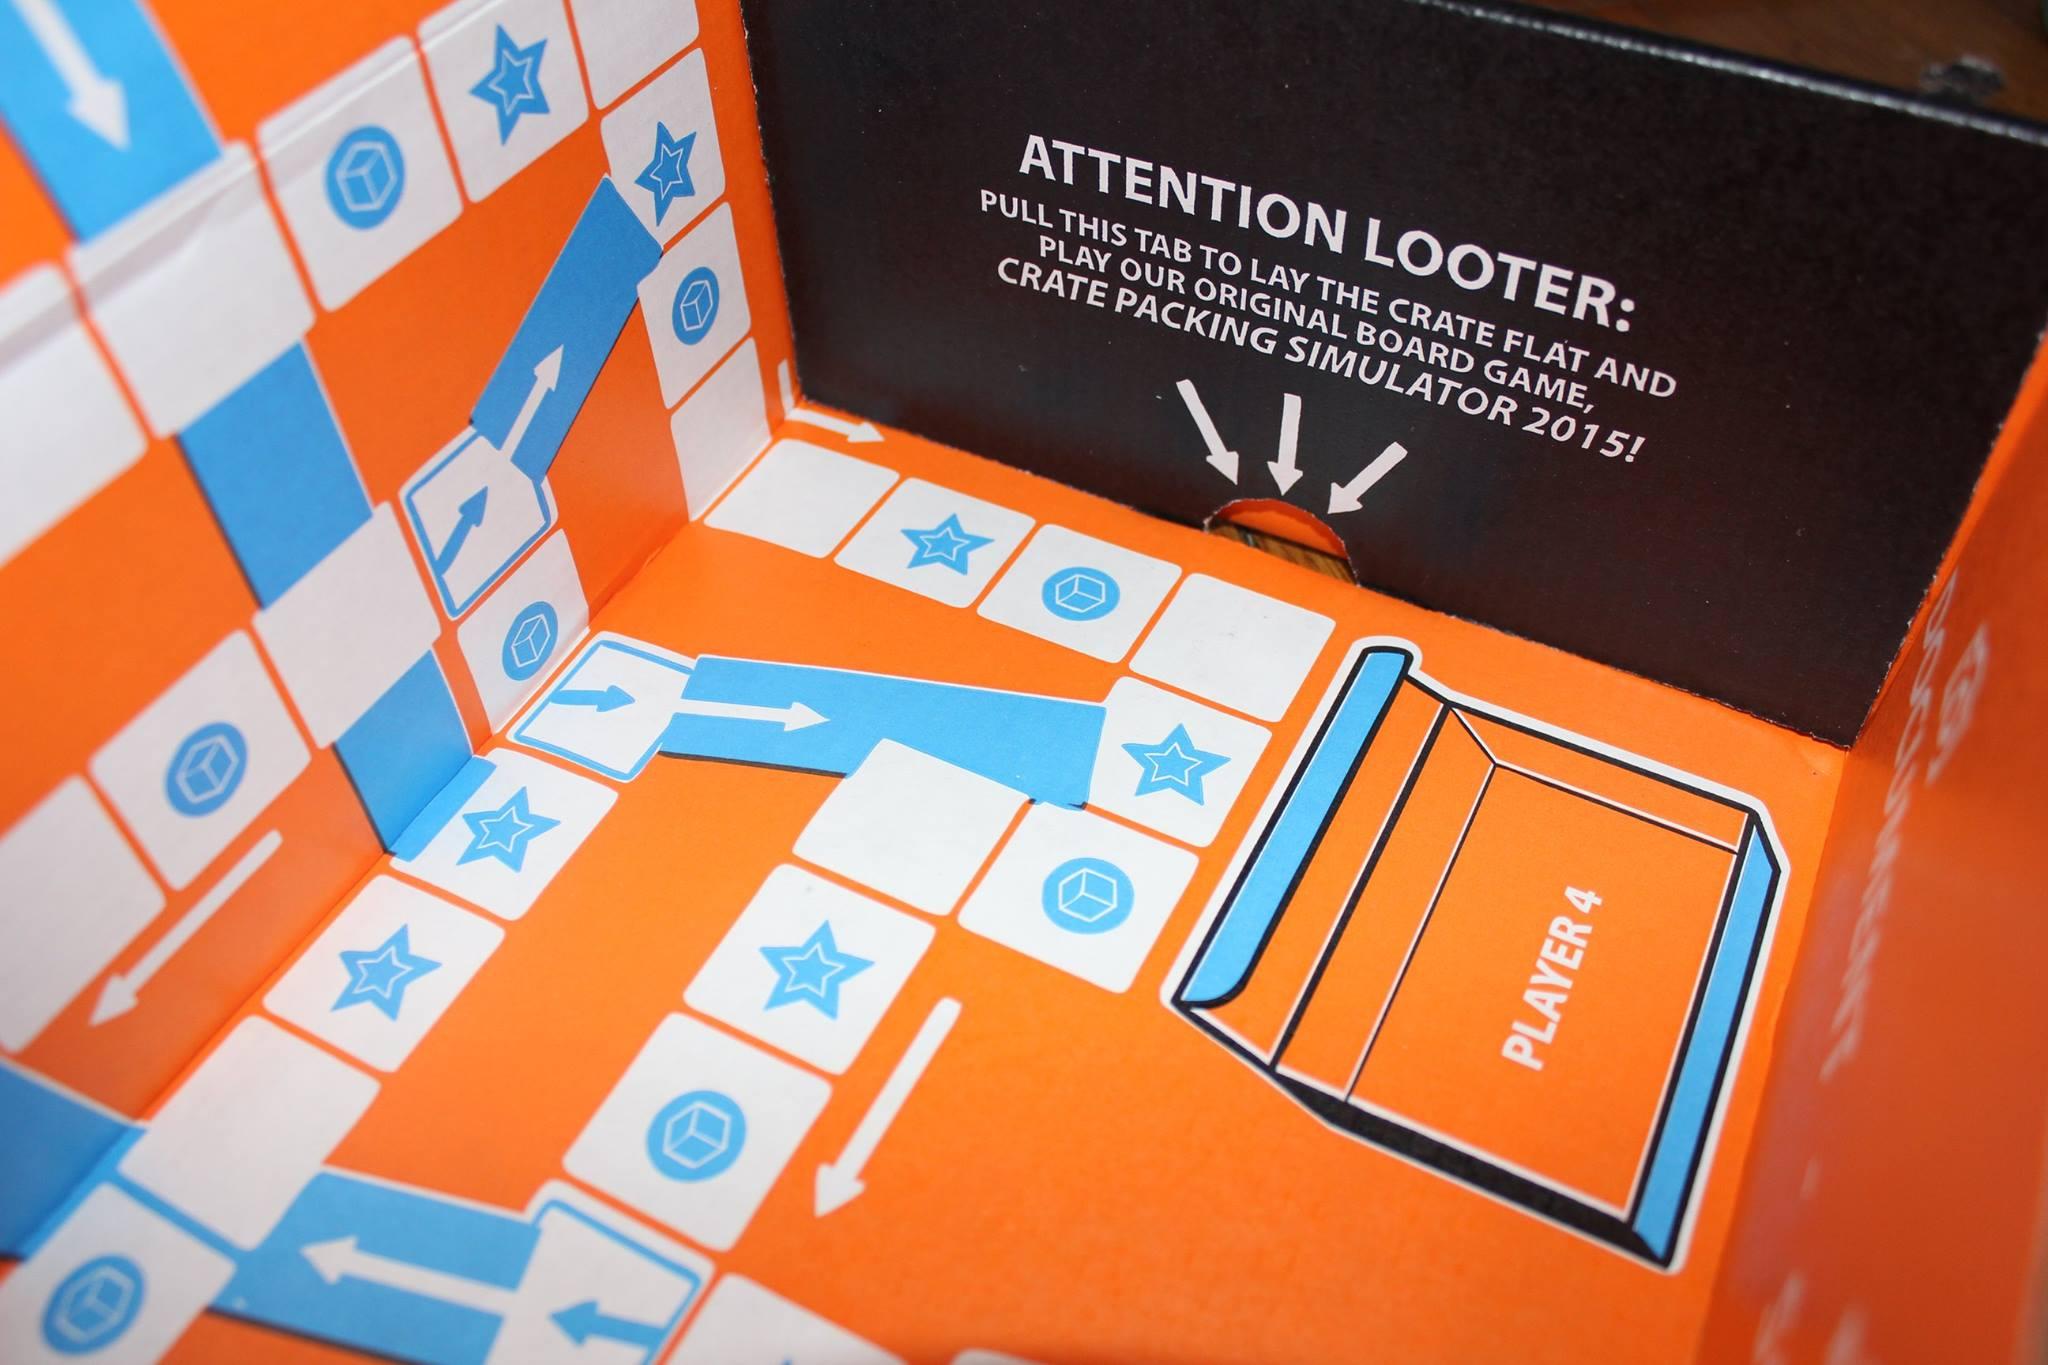 lootcrate-3